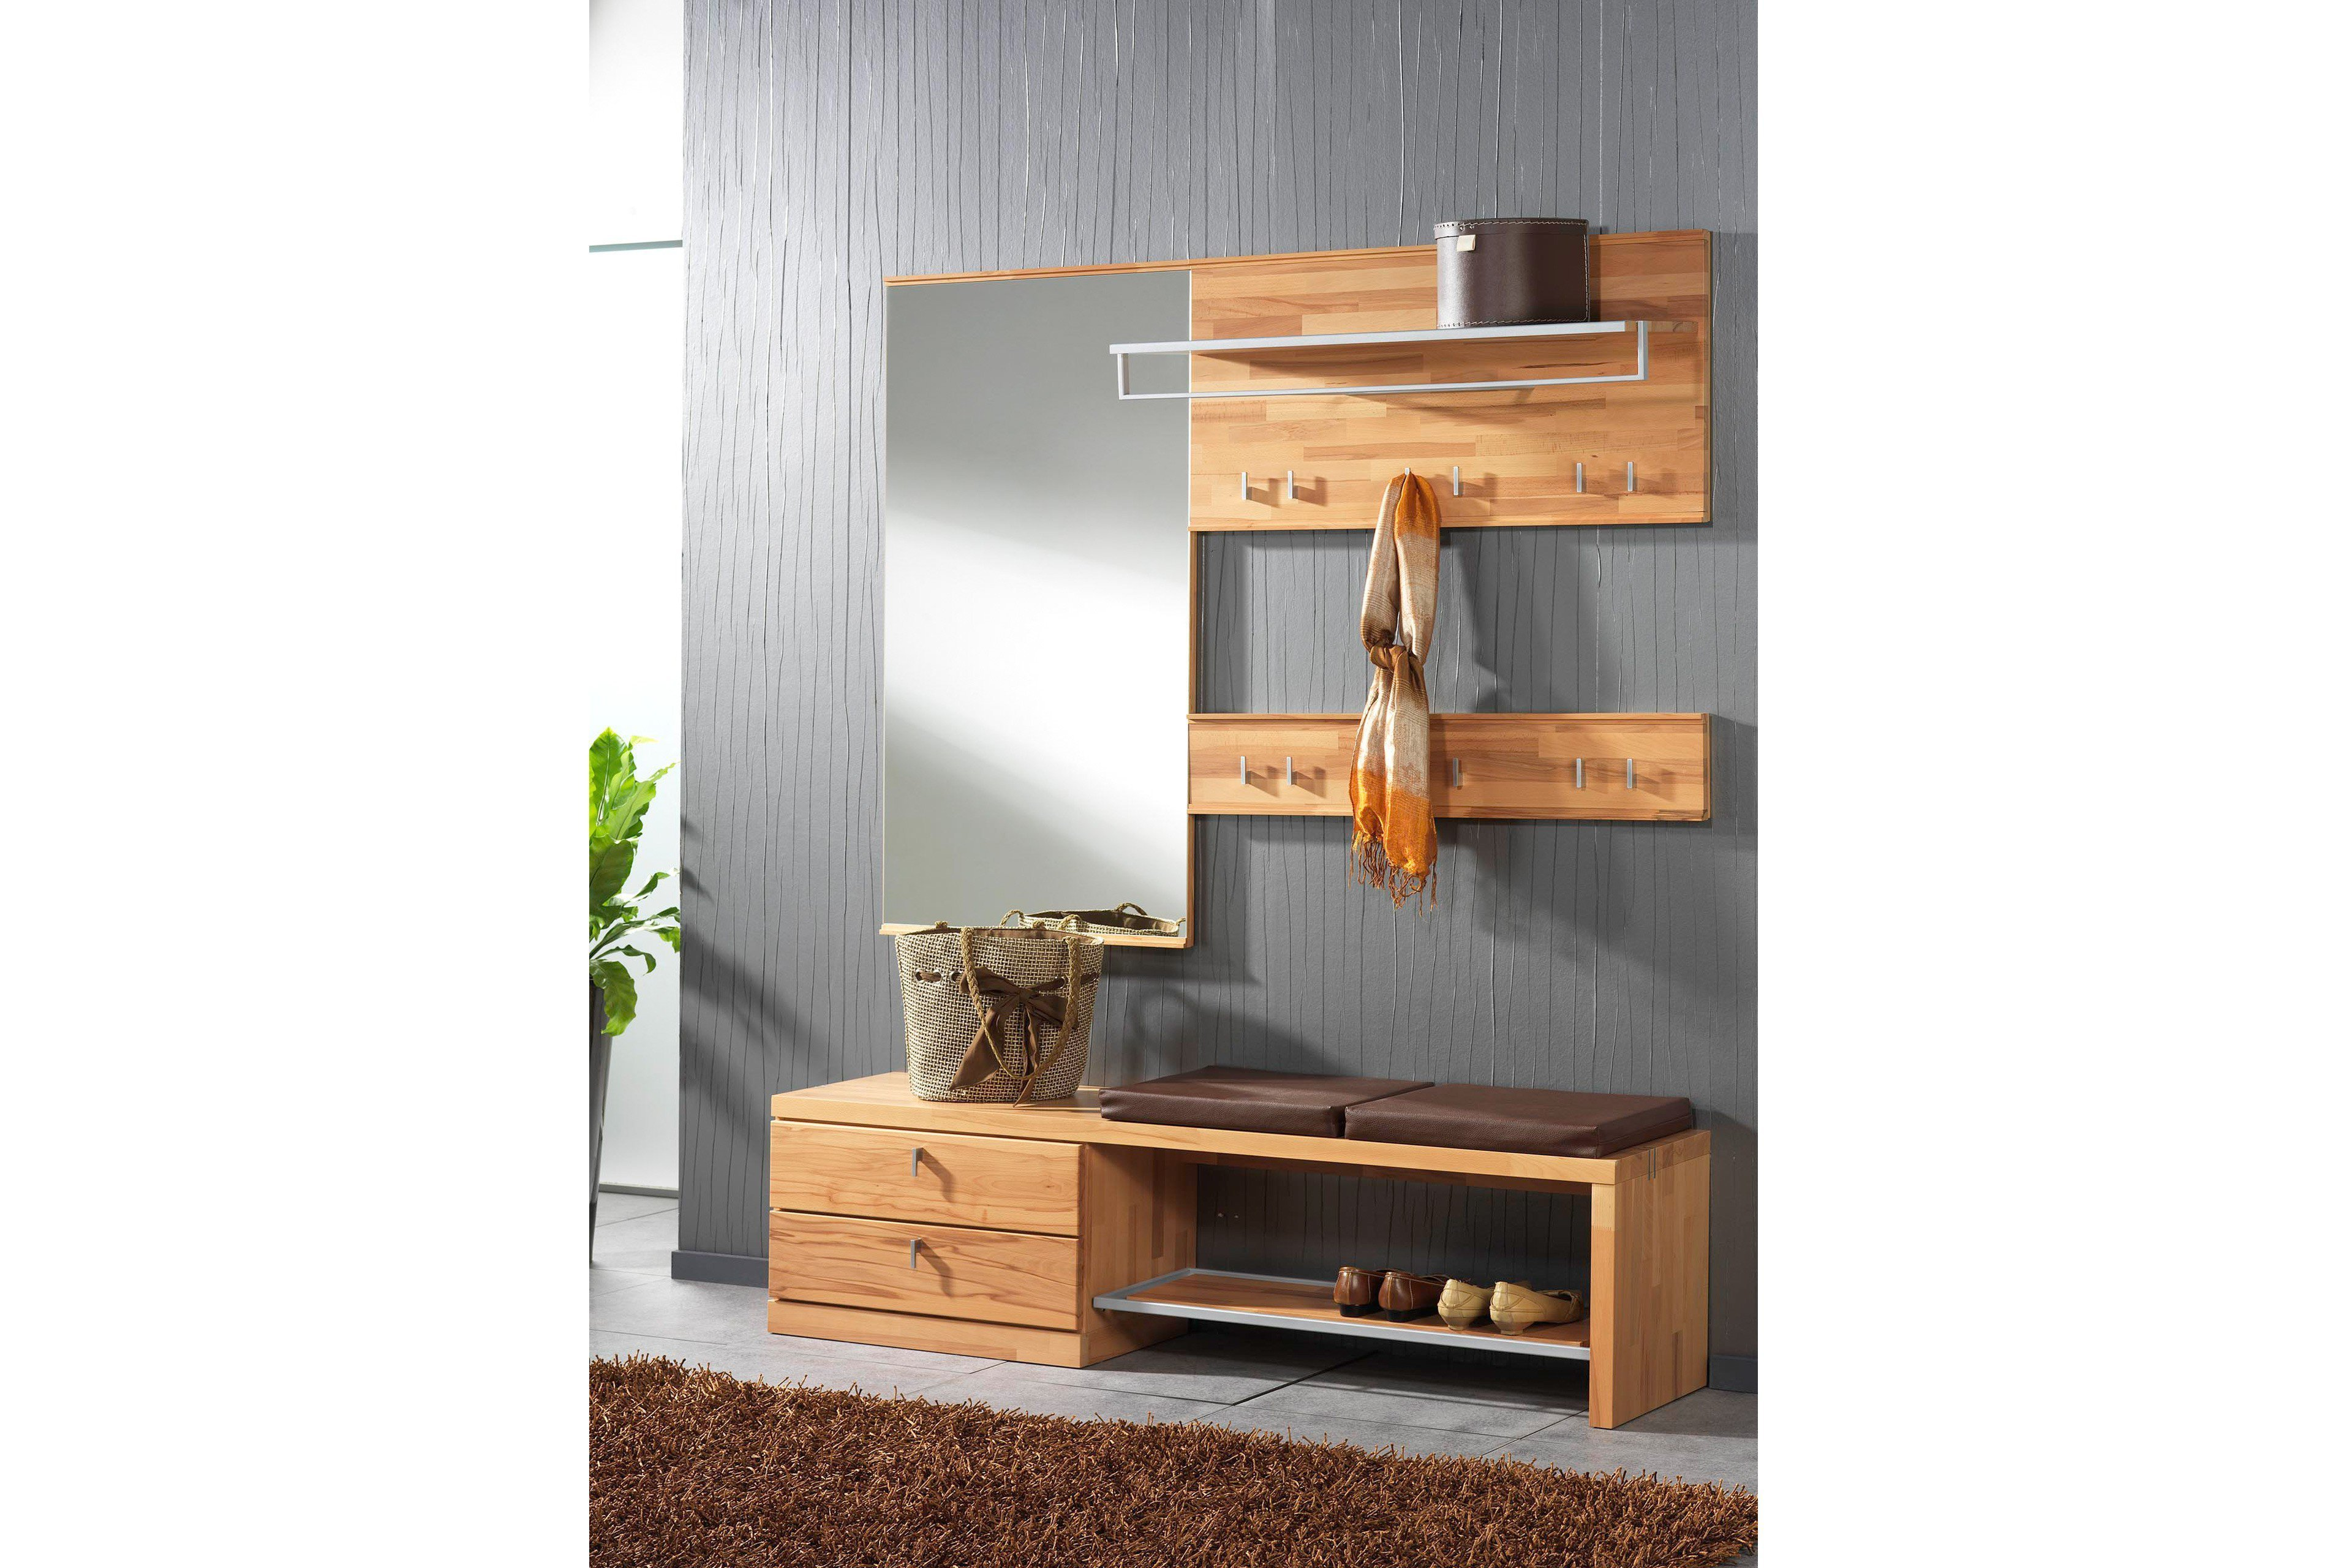 bienenm hle garderobe vado set 01 kernbuche m bel letz. Black Bedroom Furniture Sets. Home Design Ideas